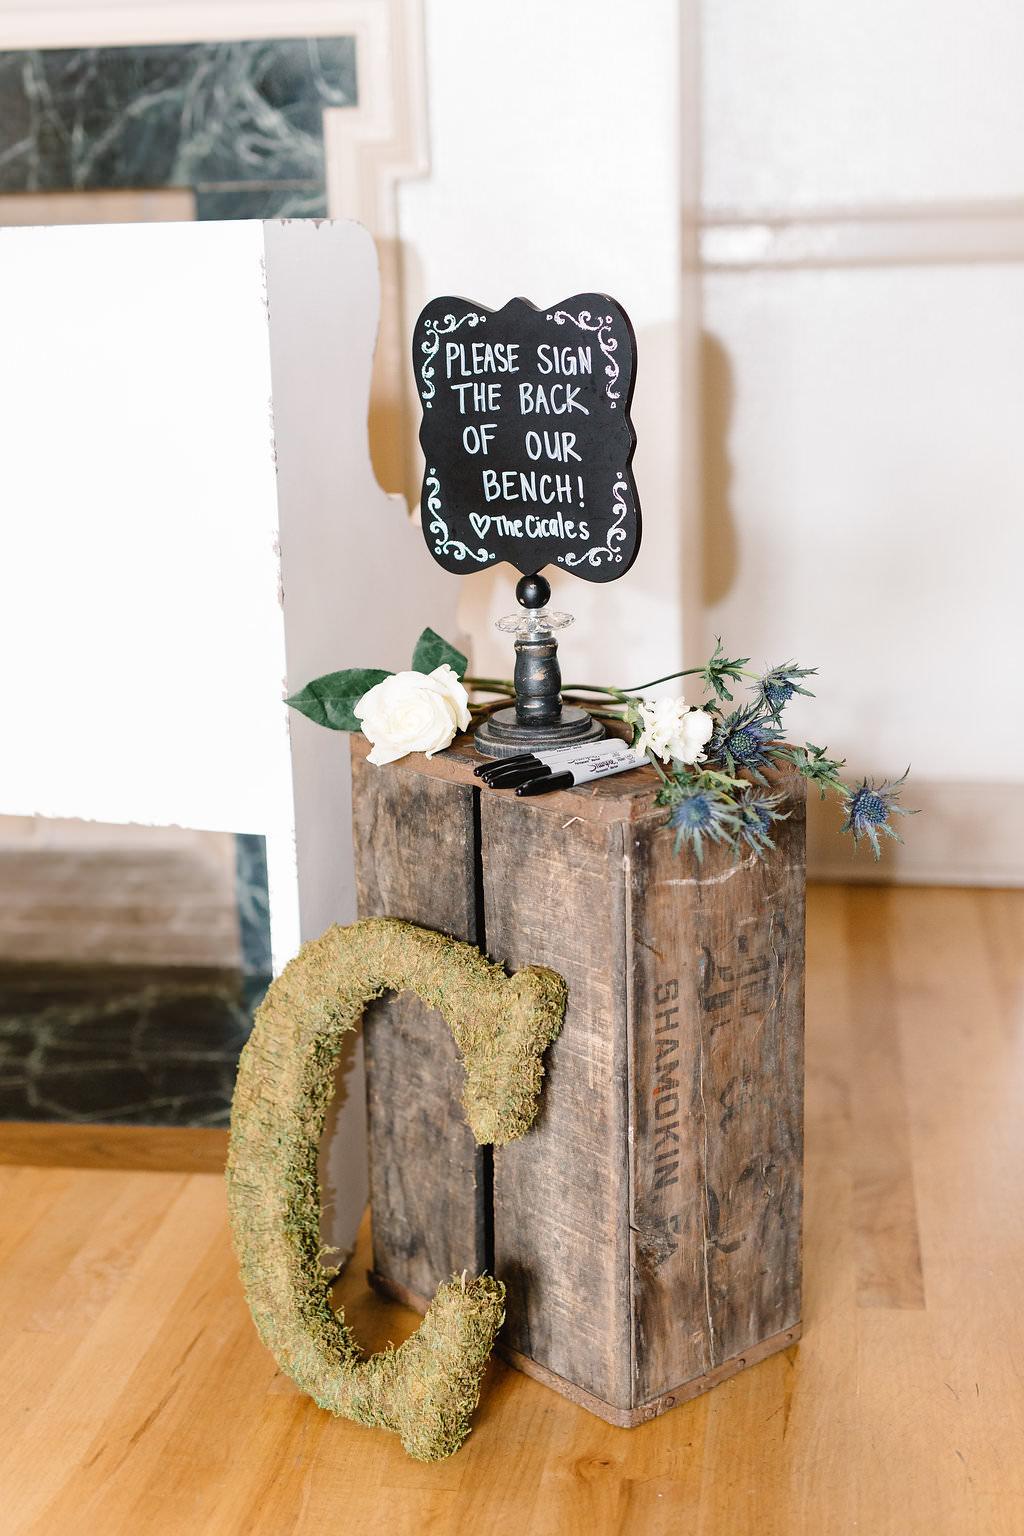 Vintage Inspired Wedding Reception Decor, Wooden Pallet Box with Chalkboard Sign   Tampa Bay Wedding Planner Love Lee Lane